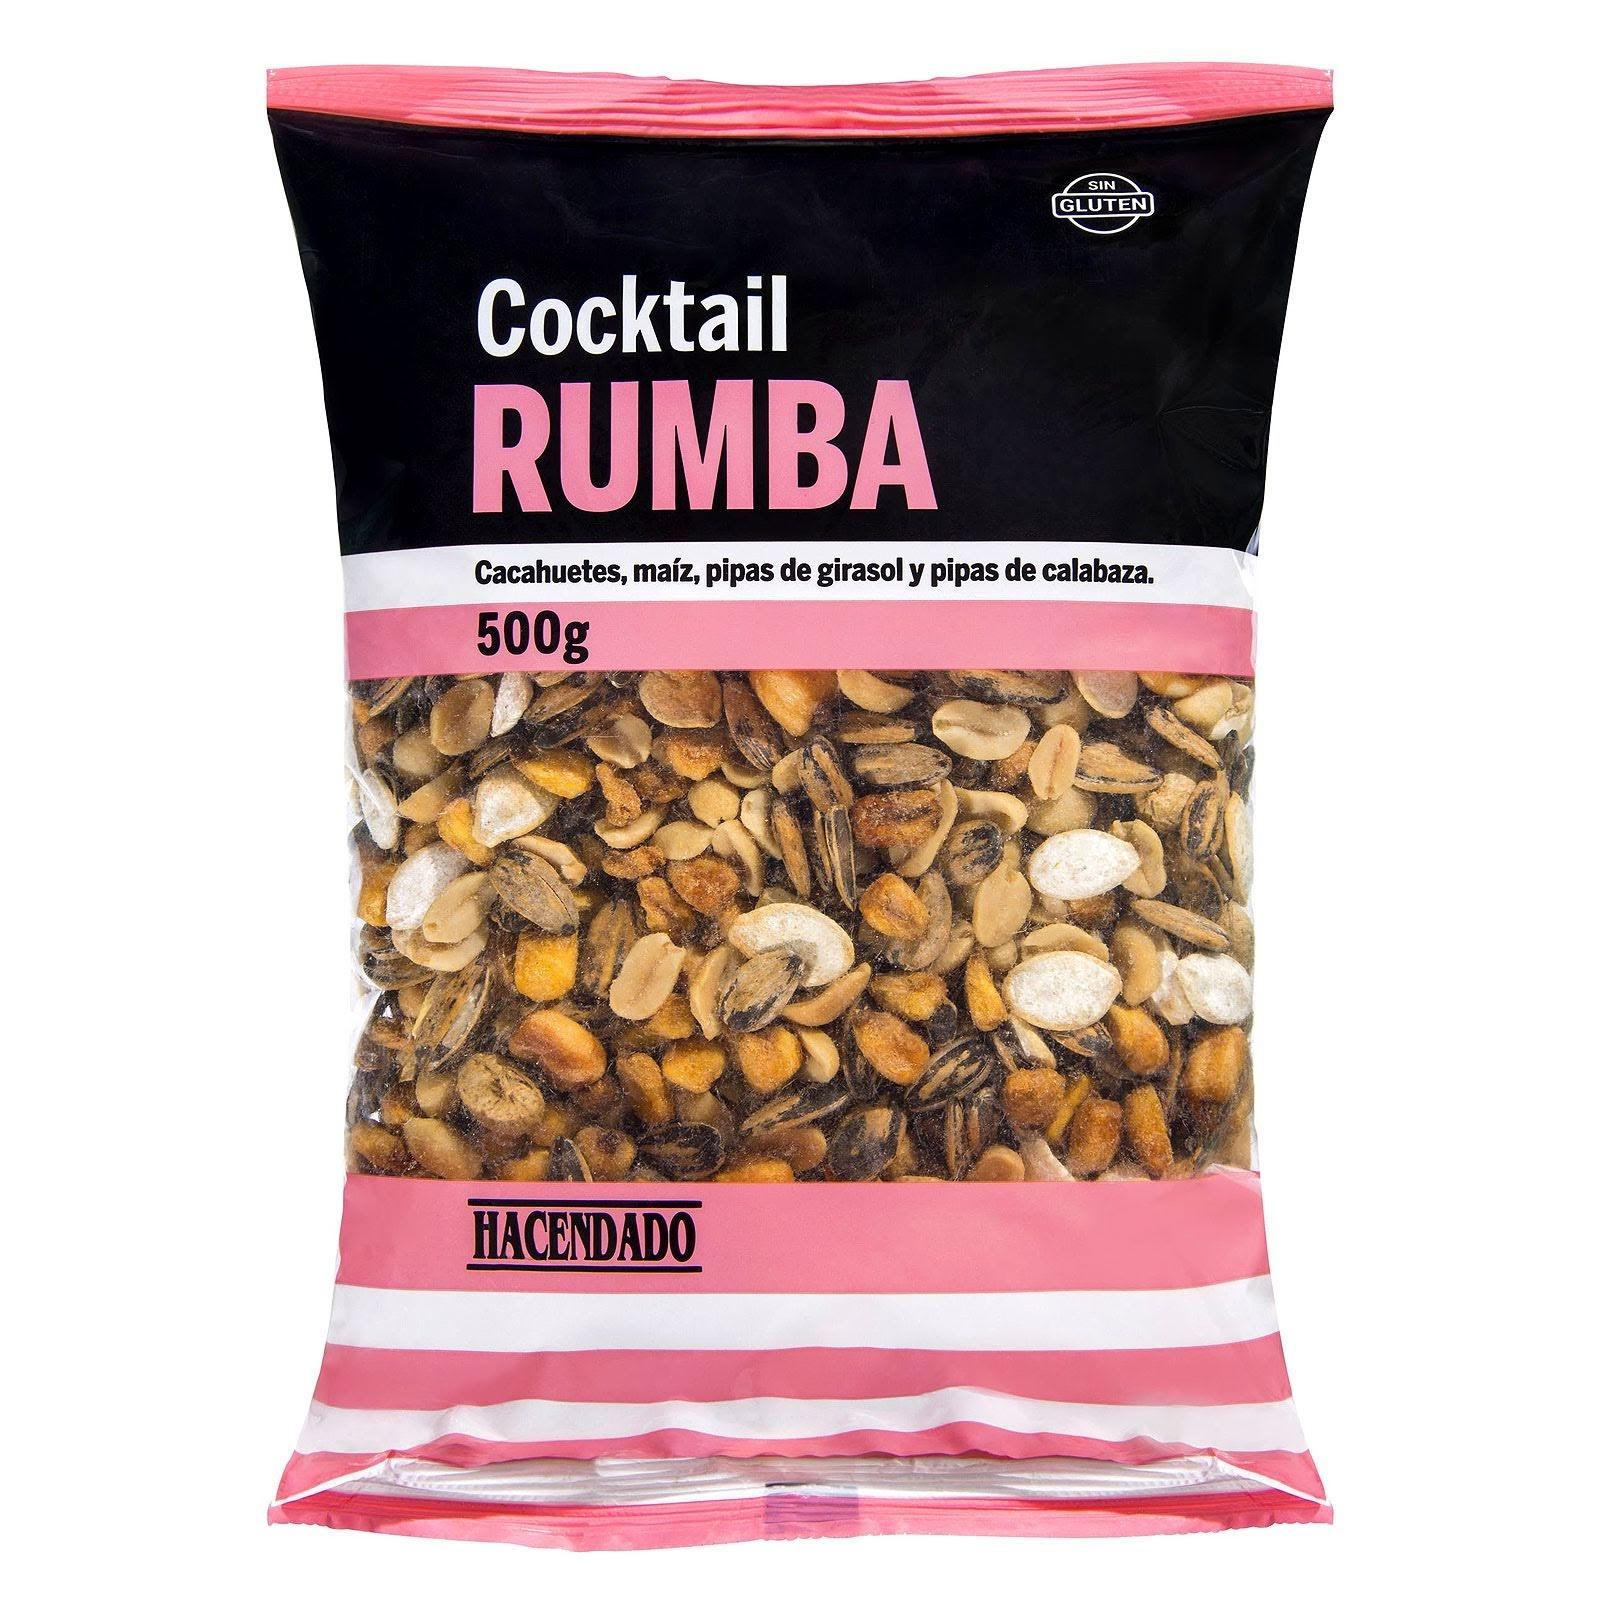 Cocktail rumba Hacendado